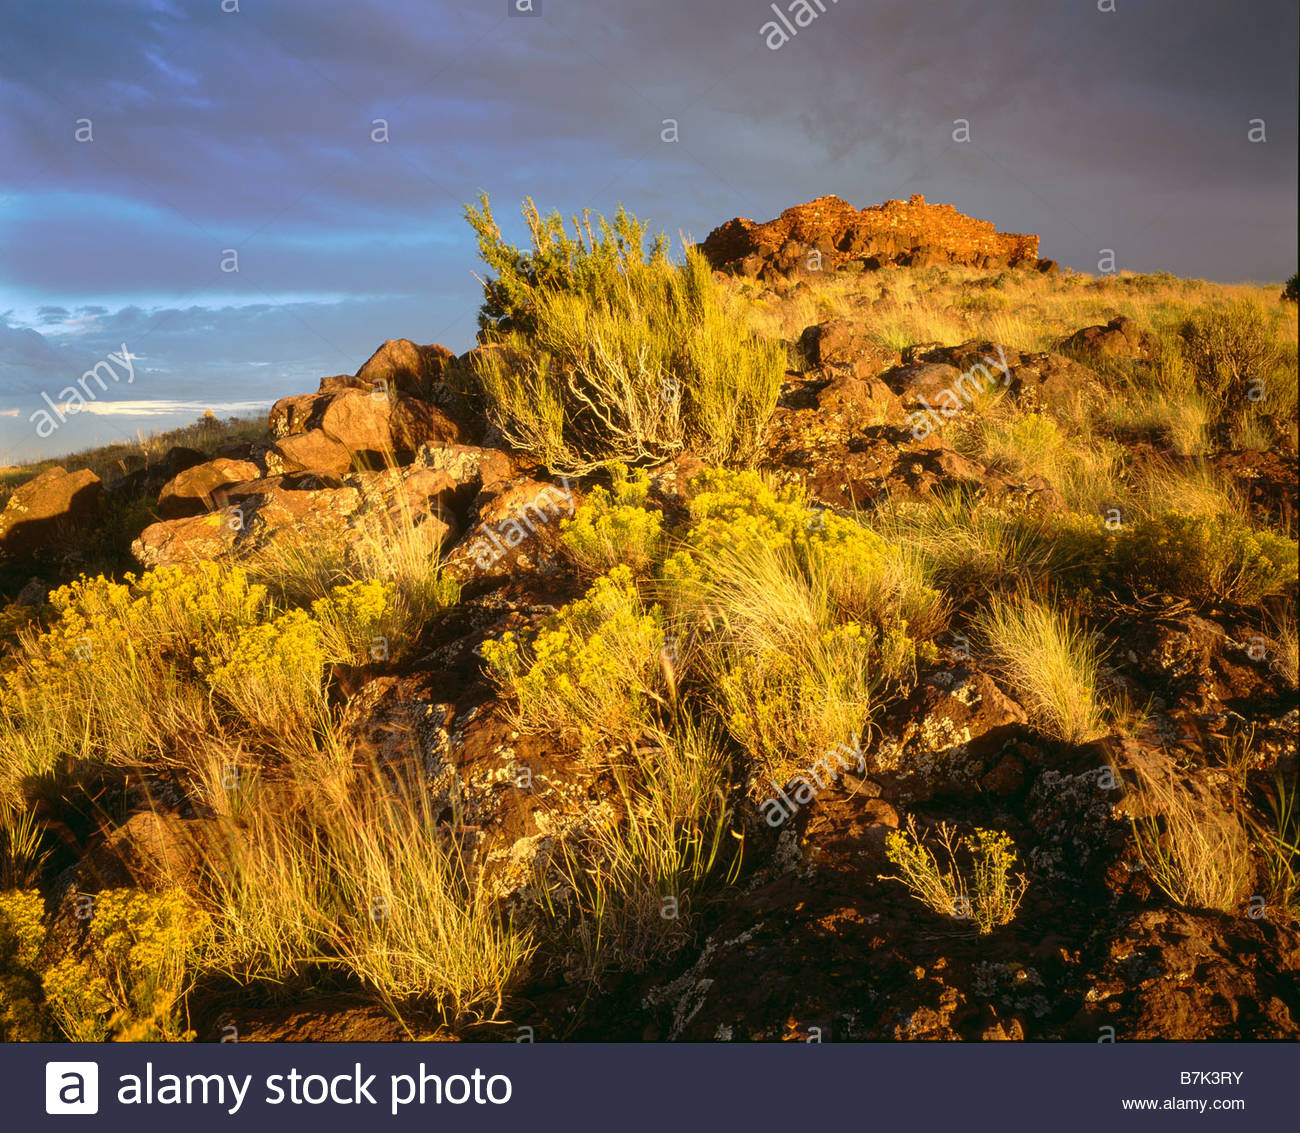 Ruins of the Sinagua culture Citadel hilltop Pueblo Wupatki National Monument Arizona Stock Photo